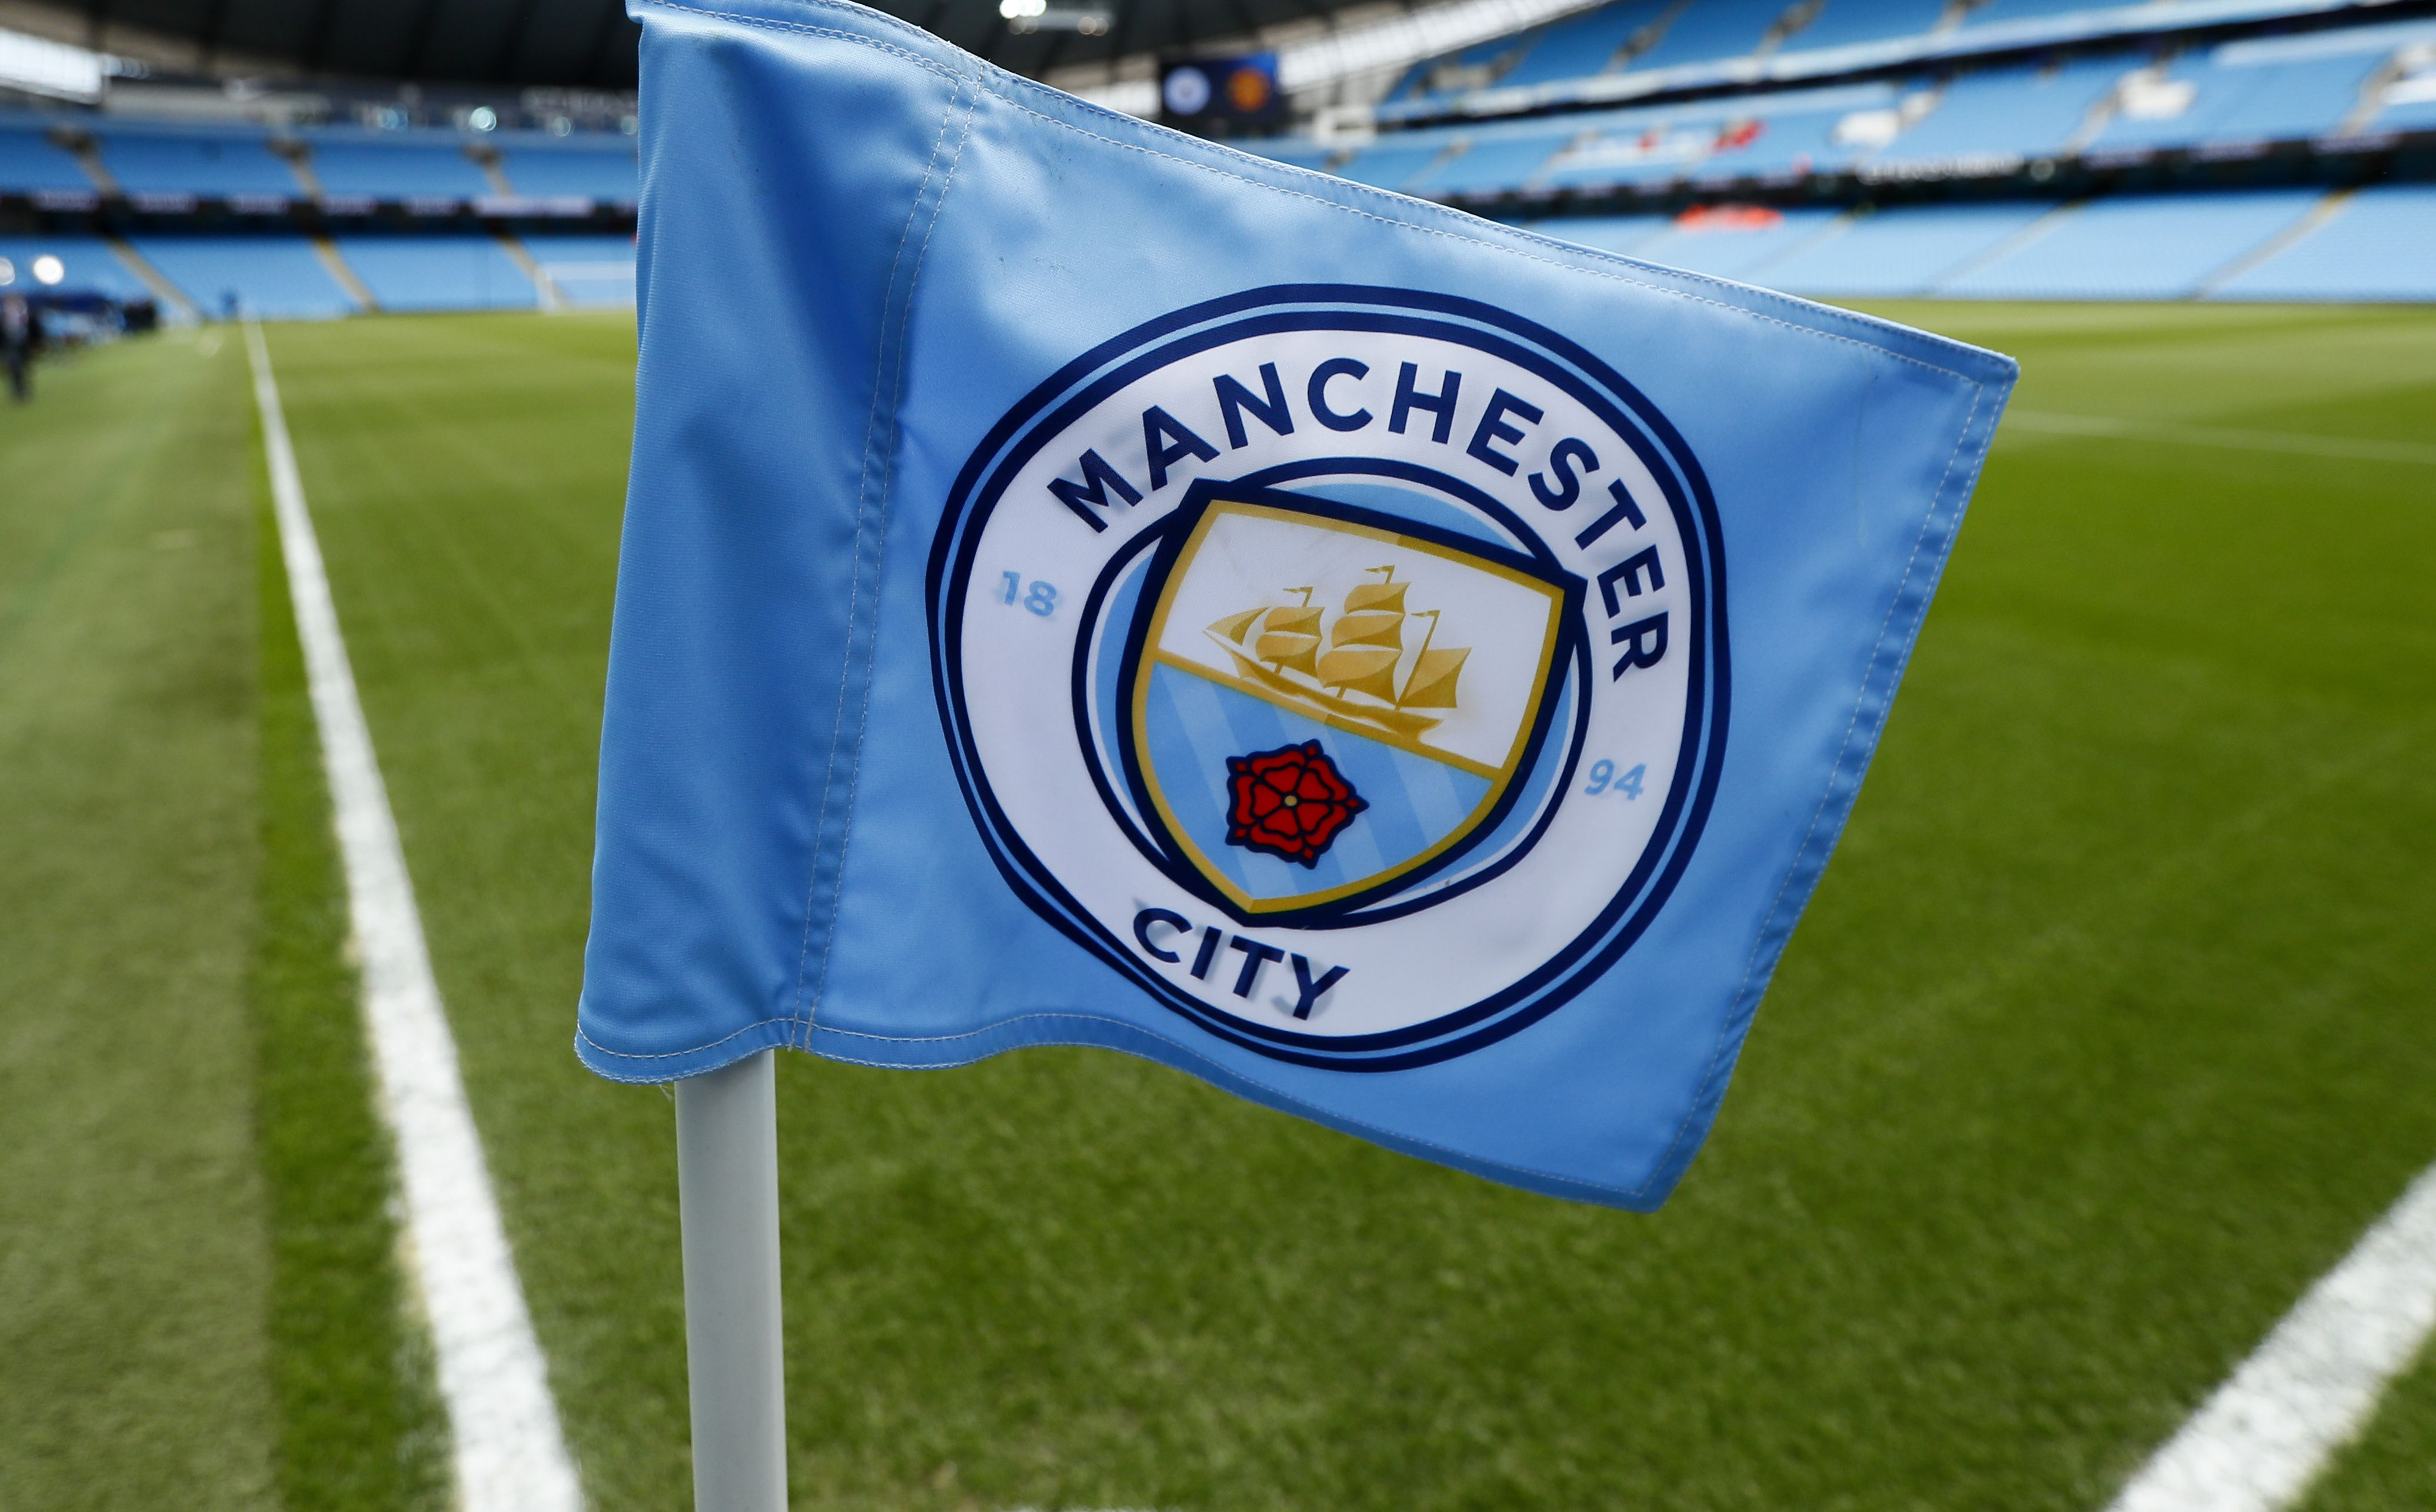 Football - Etranger - Manchester City rachète le club espagnol de Gérone